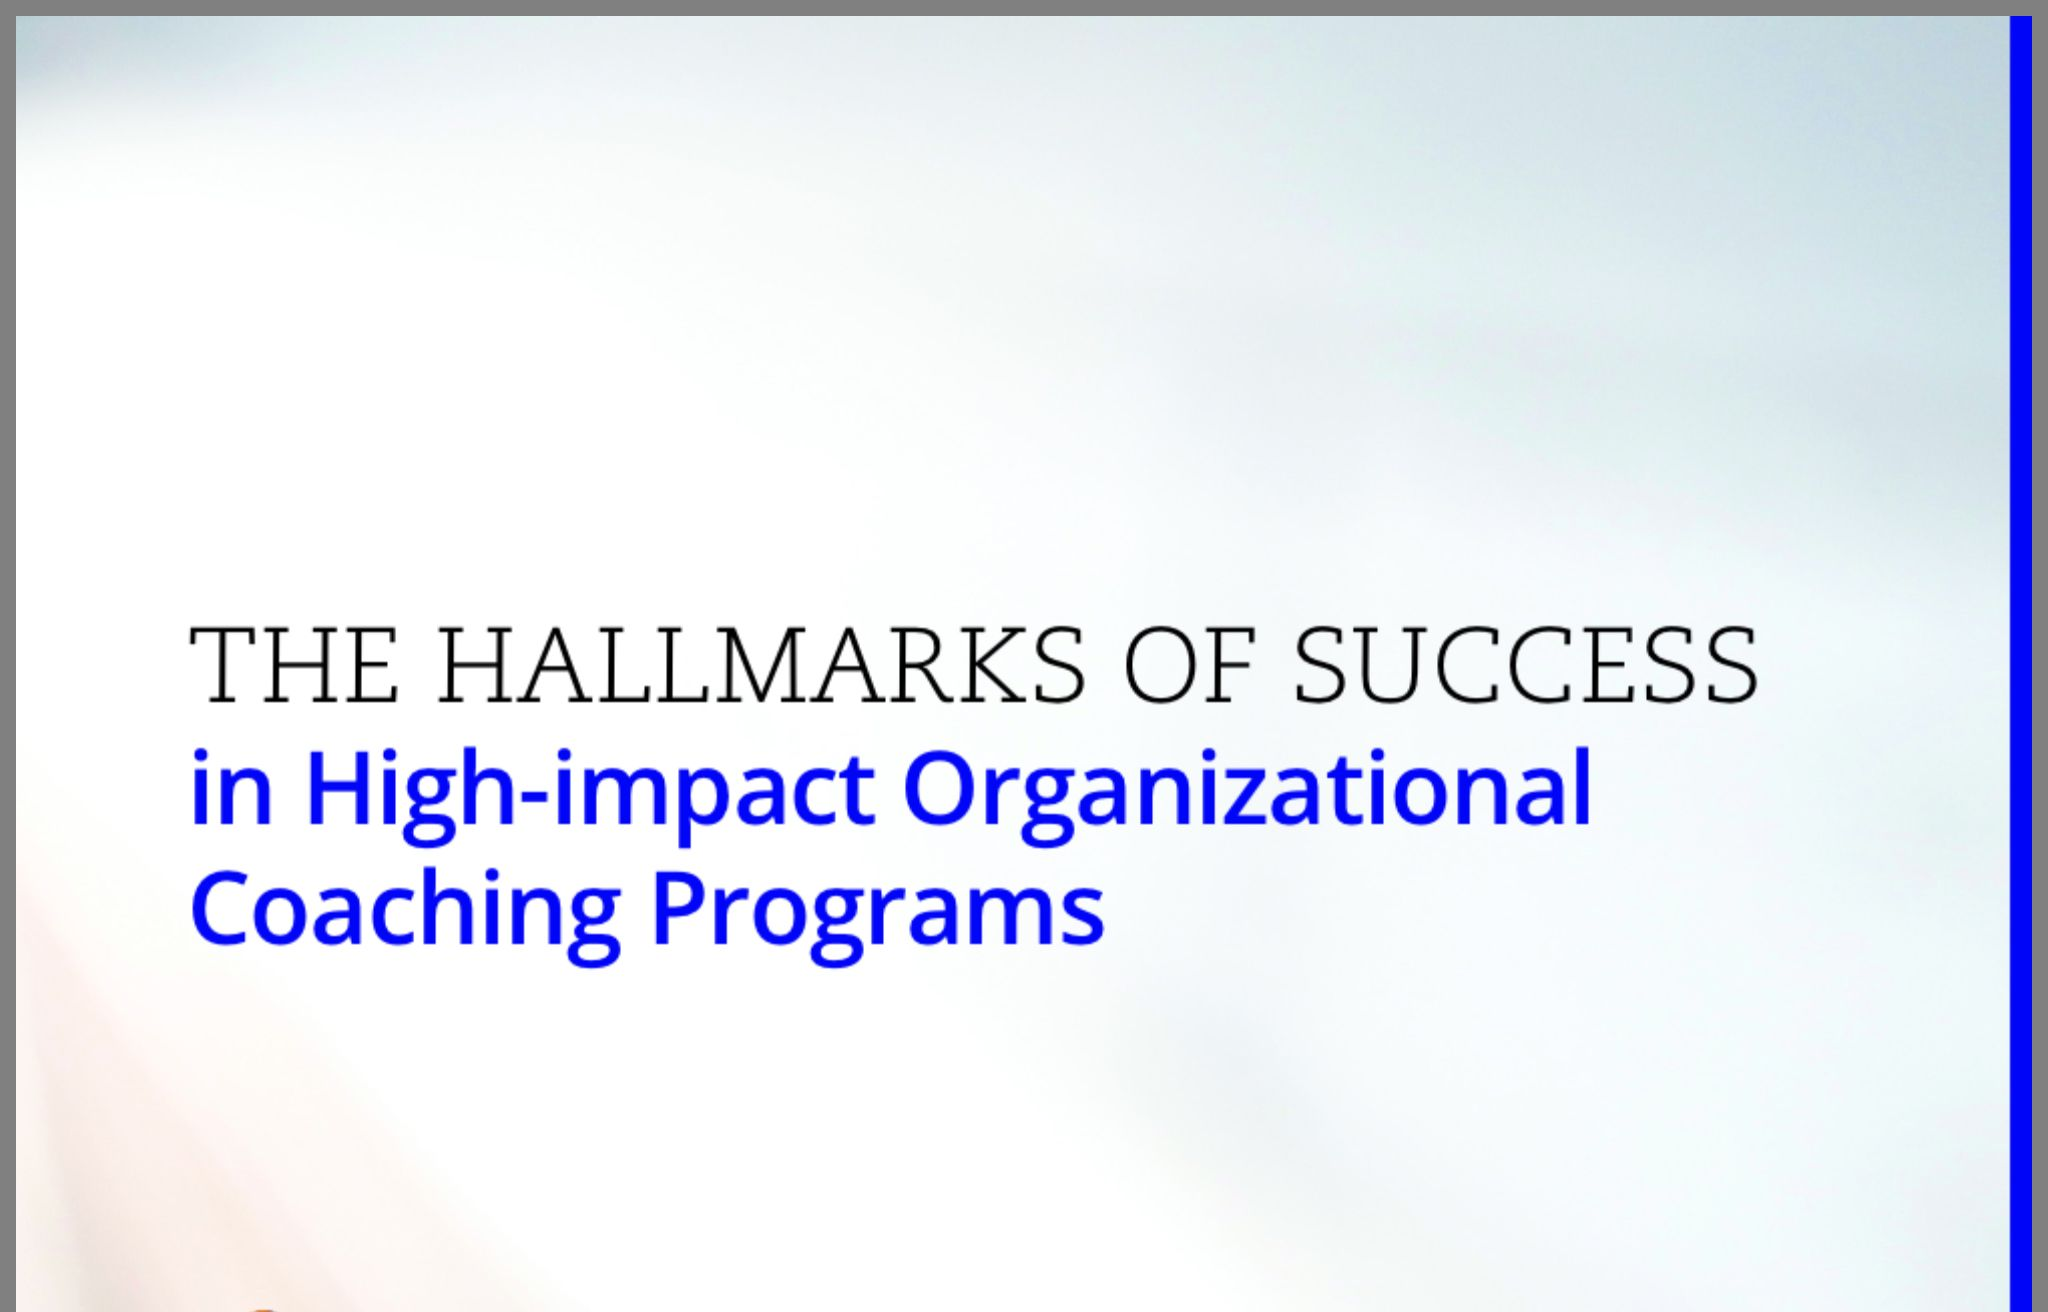 http://www.coachfederation.org/files/HallmarksofSuccess2014.pdf?_ga=1.135870705.1719256801.1359644703